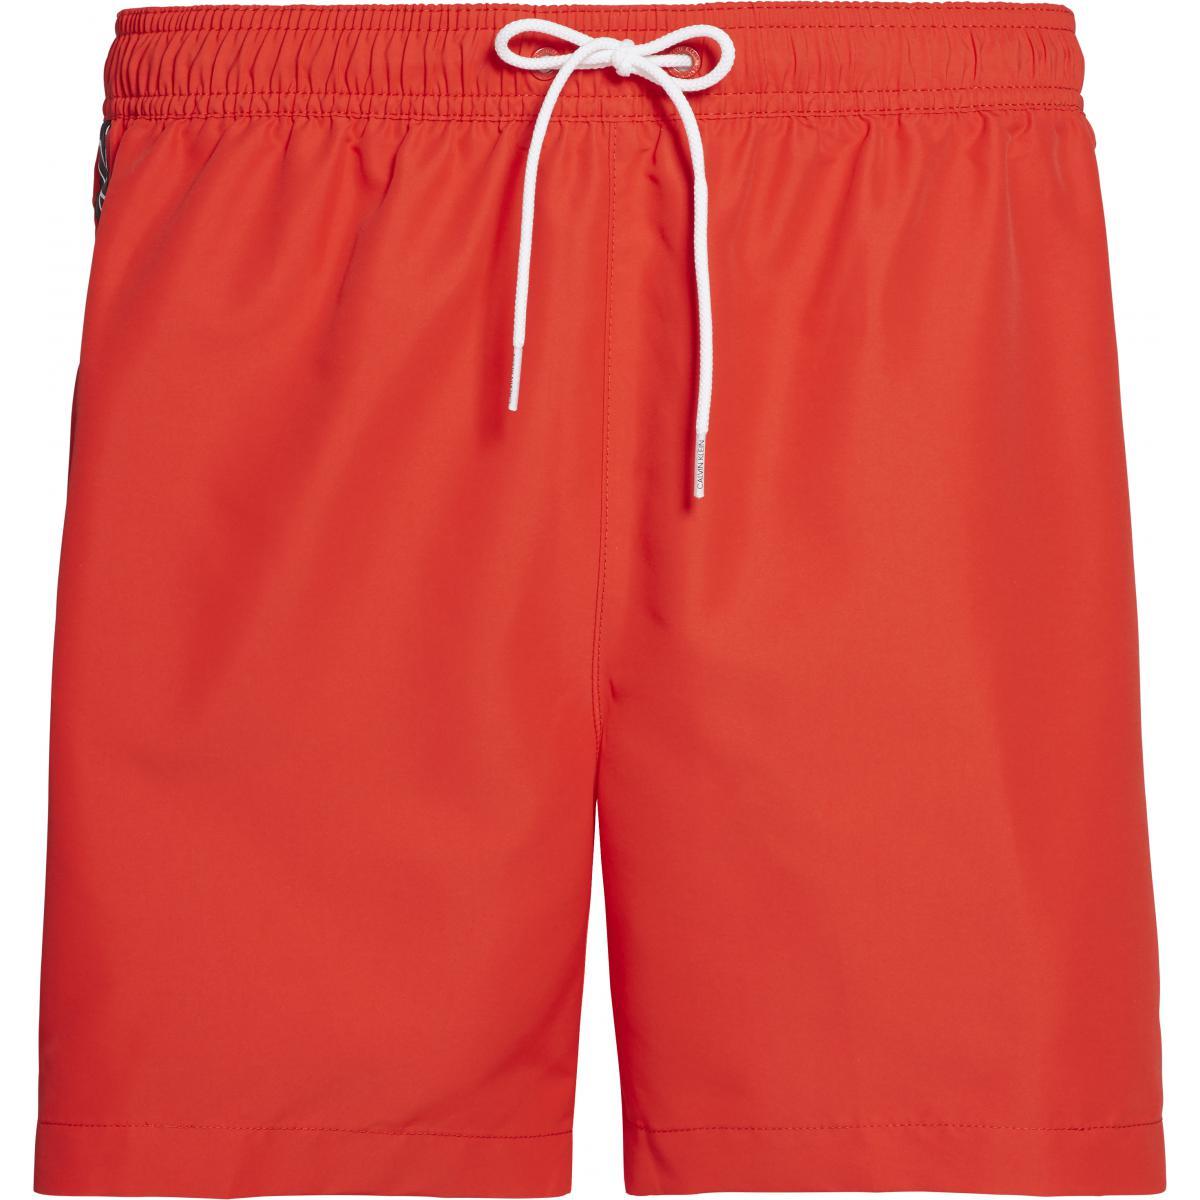 Short de bain mi-long rouge - Calvin Klein Underwear - Modalova